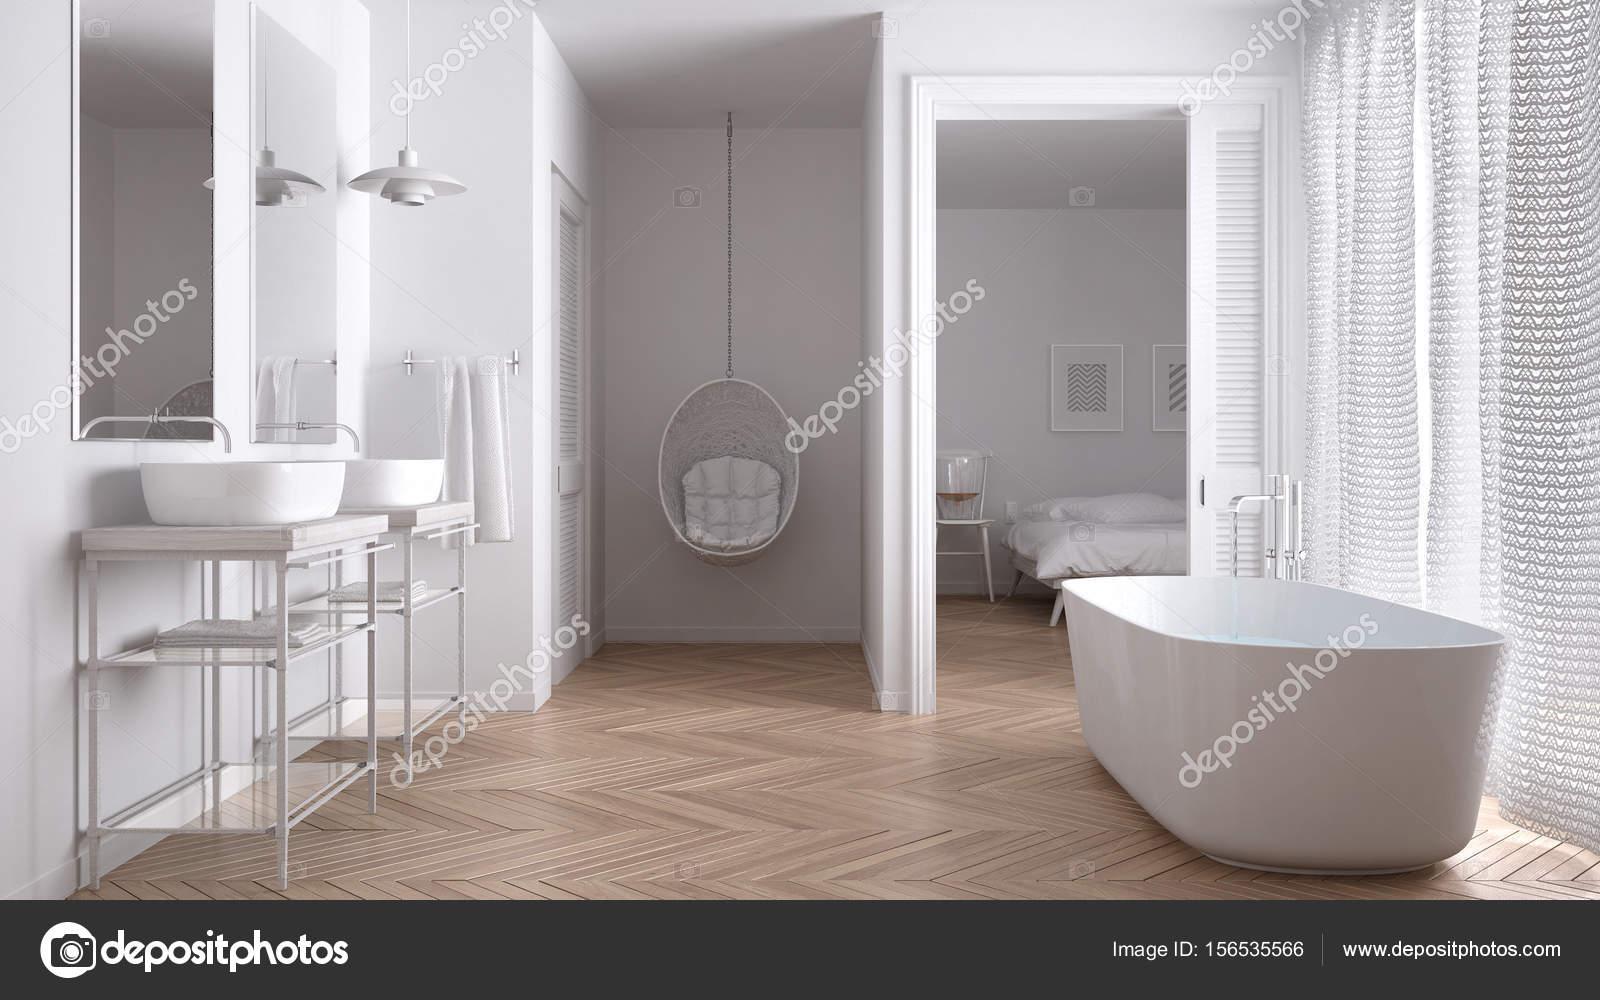 Badkamer In Slaapkamer : Minimalistische witte scandinavische badkamer met slaapkamer in